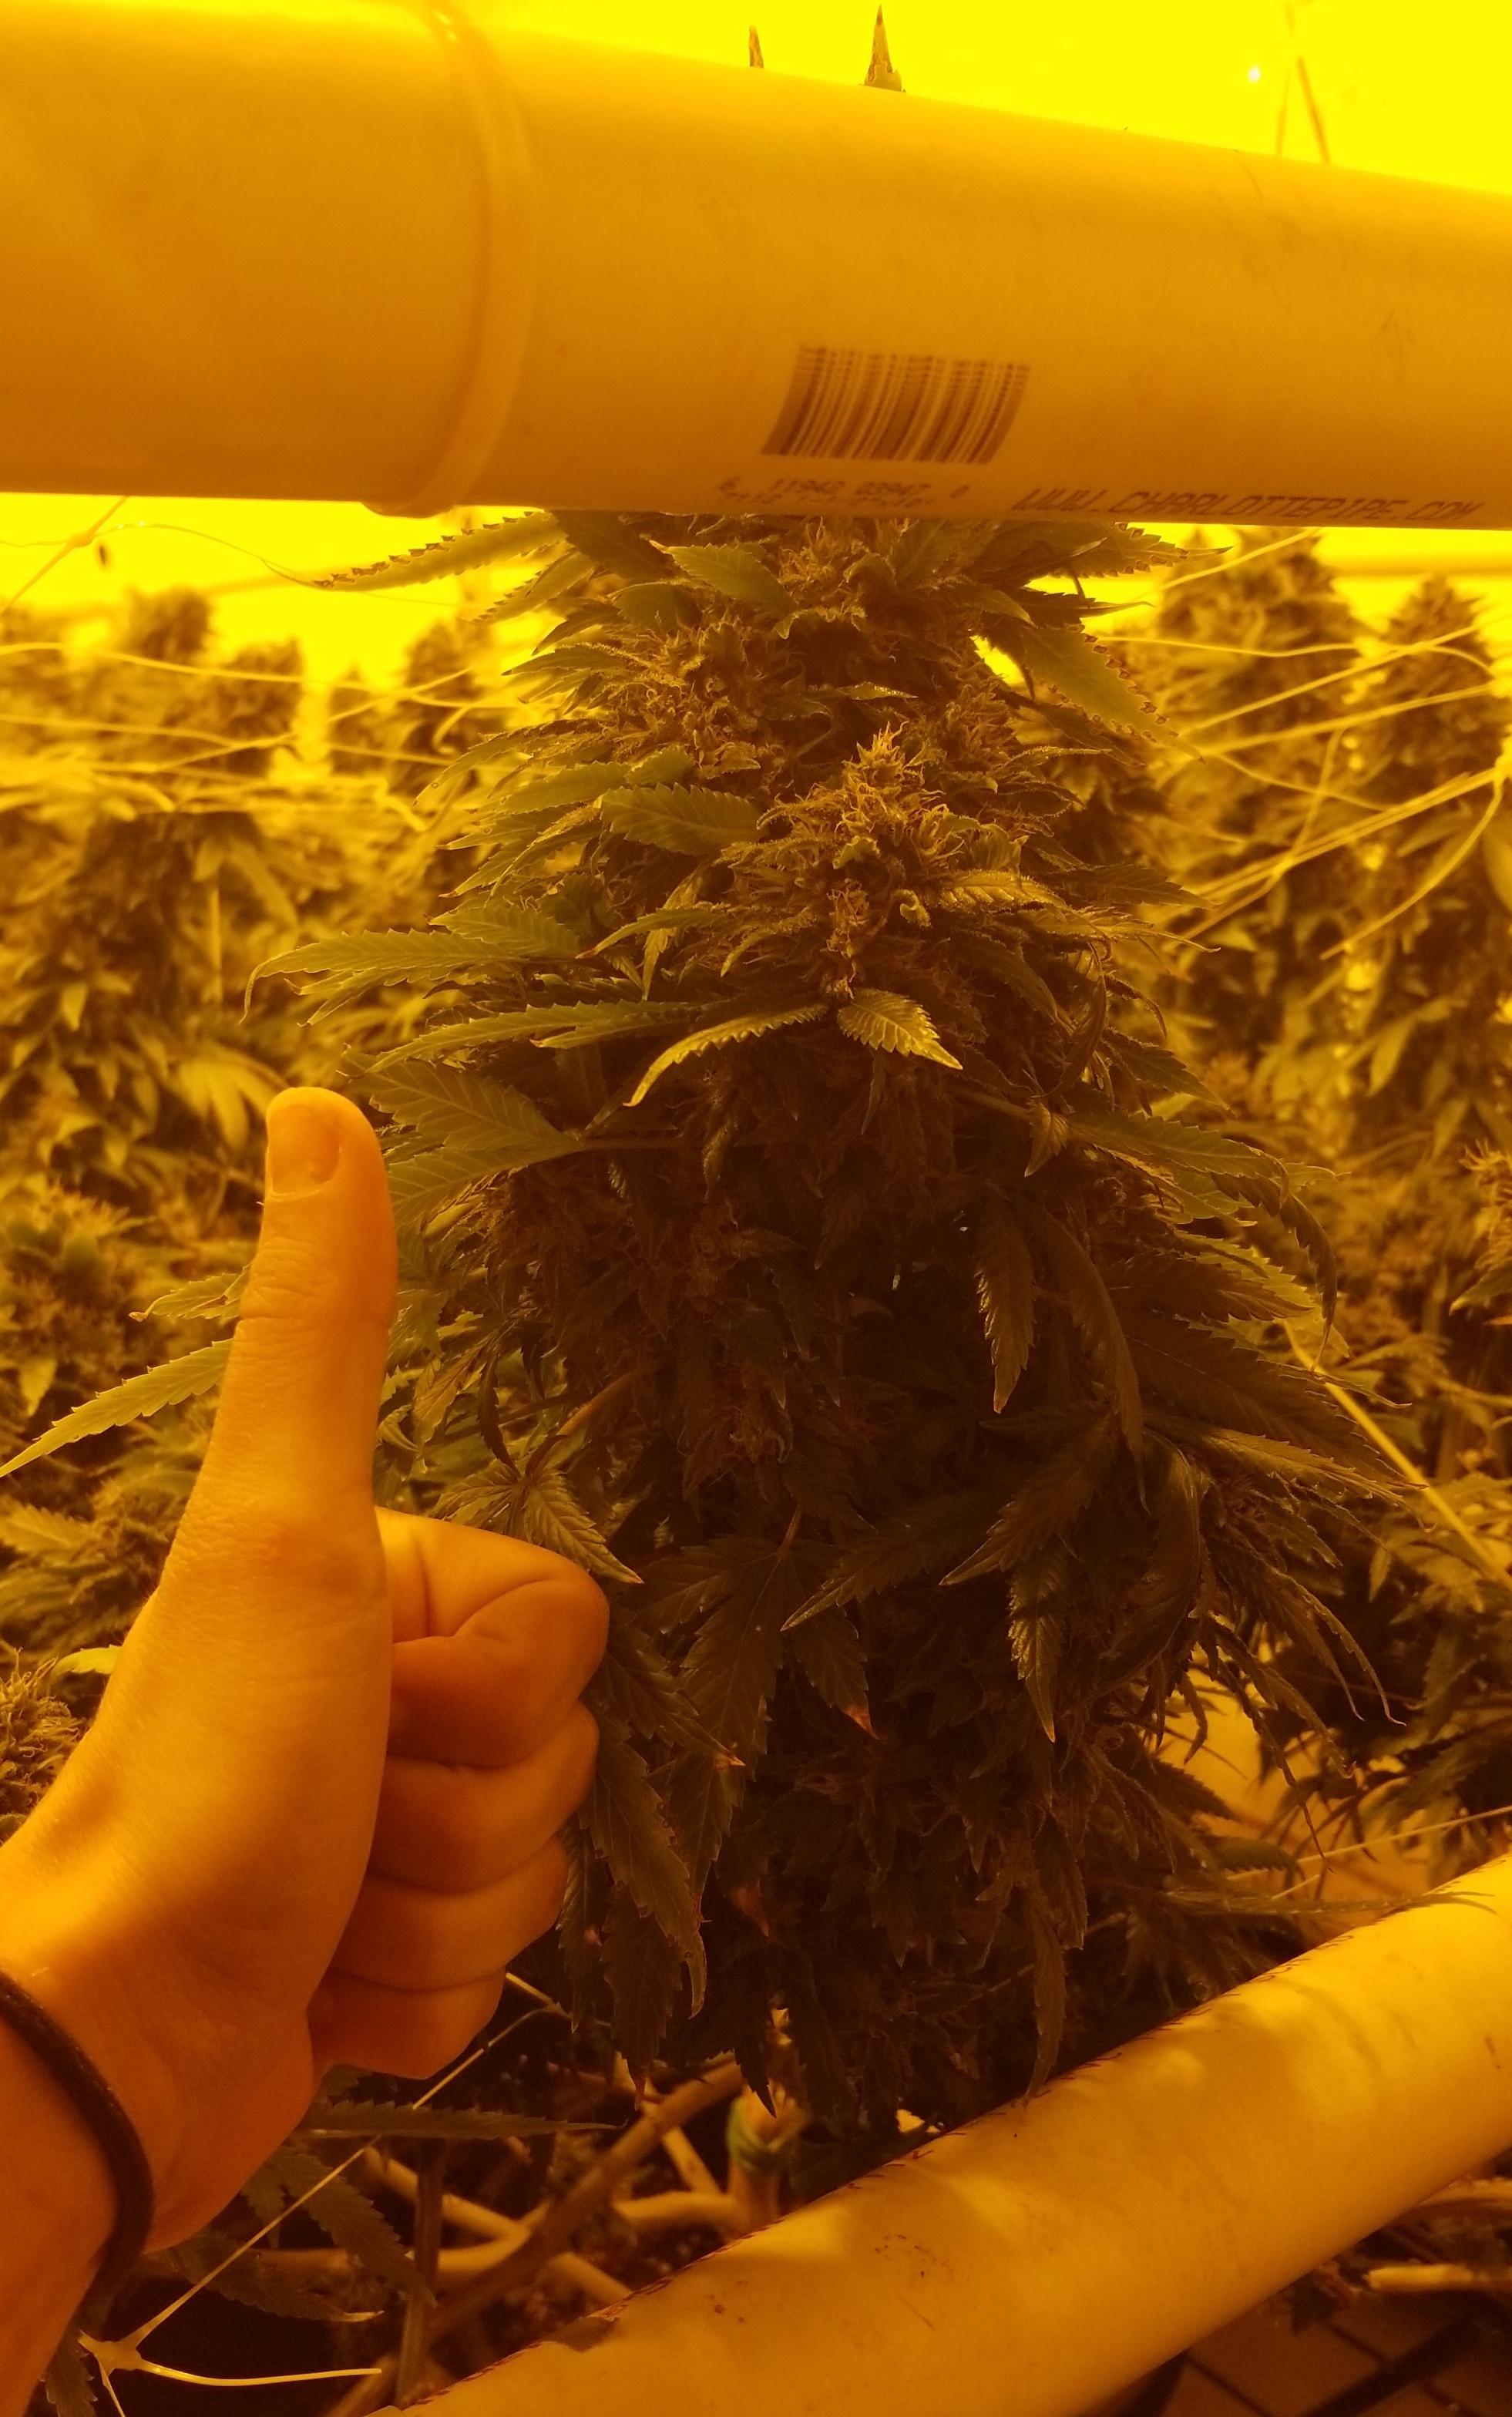 cannabiscolabigbudflower.jpg